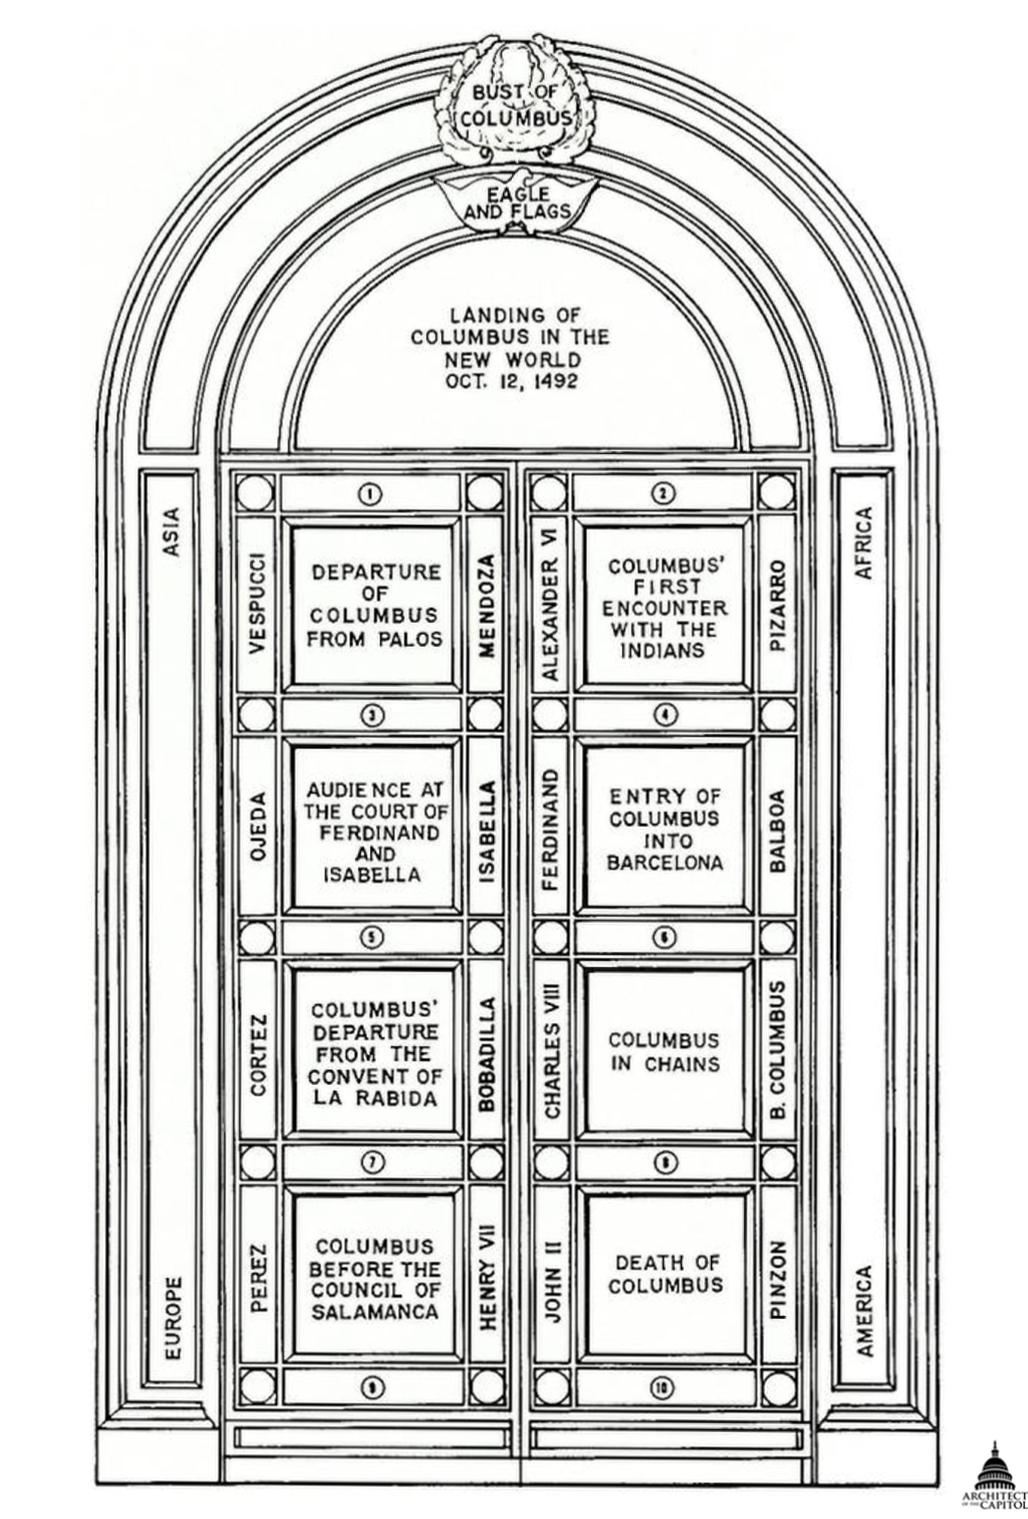 FileUSA Capitol - Columbus Doors Drawing AOC.png  sc 1 st  Wikimedia Commons & File:USA Capitol - Columbus Doors Drawing AOC.png - Wikimedia Commons